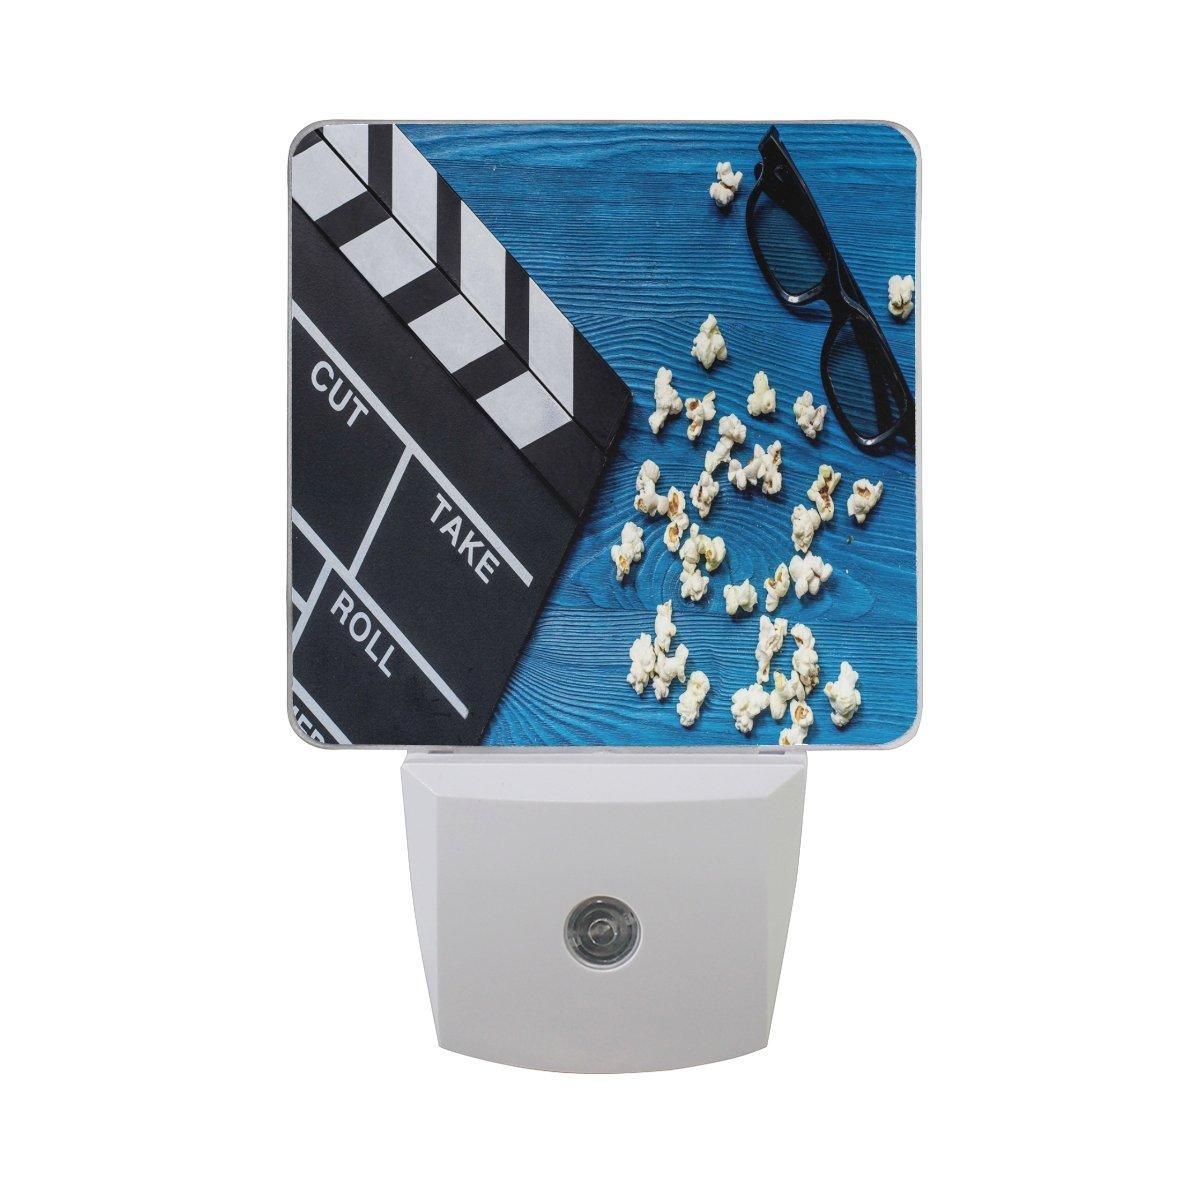 ALAZA Film Movie Clap Blue Wooden LED Night Light Dusk to Dawn Sensor Plug in Night Home Decor Desk Lamp for Adult